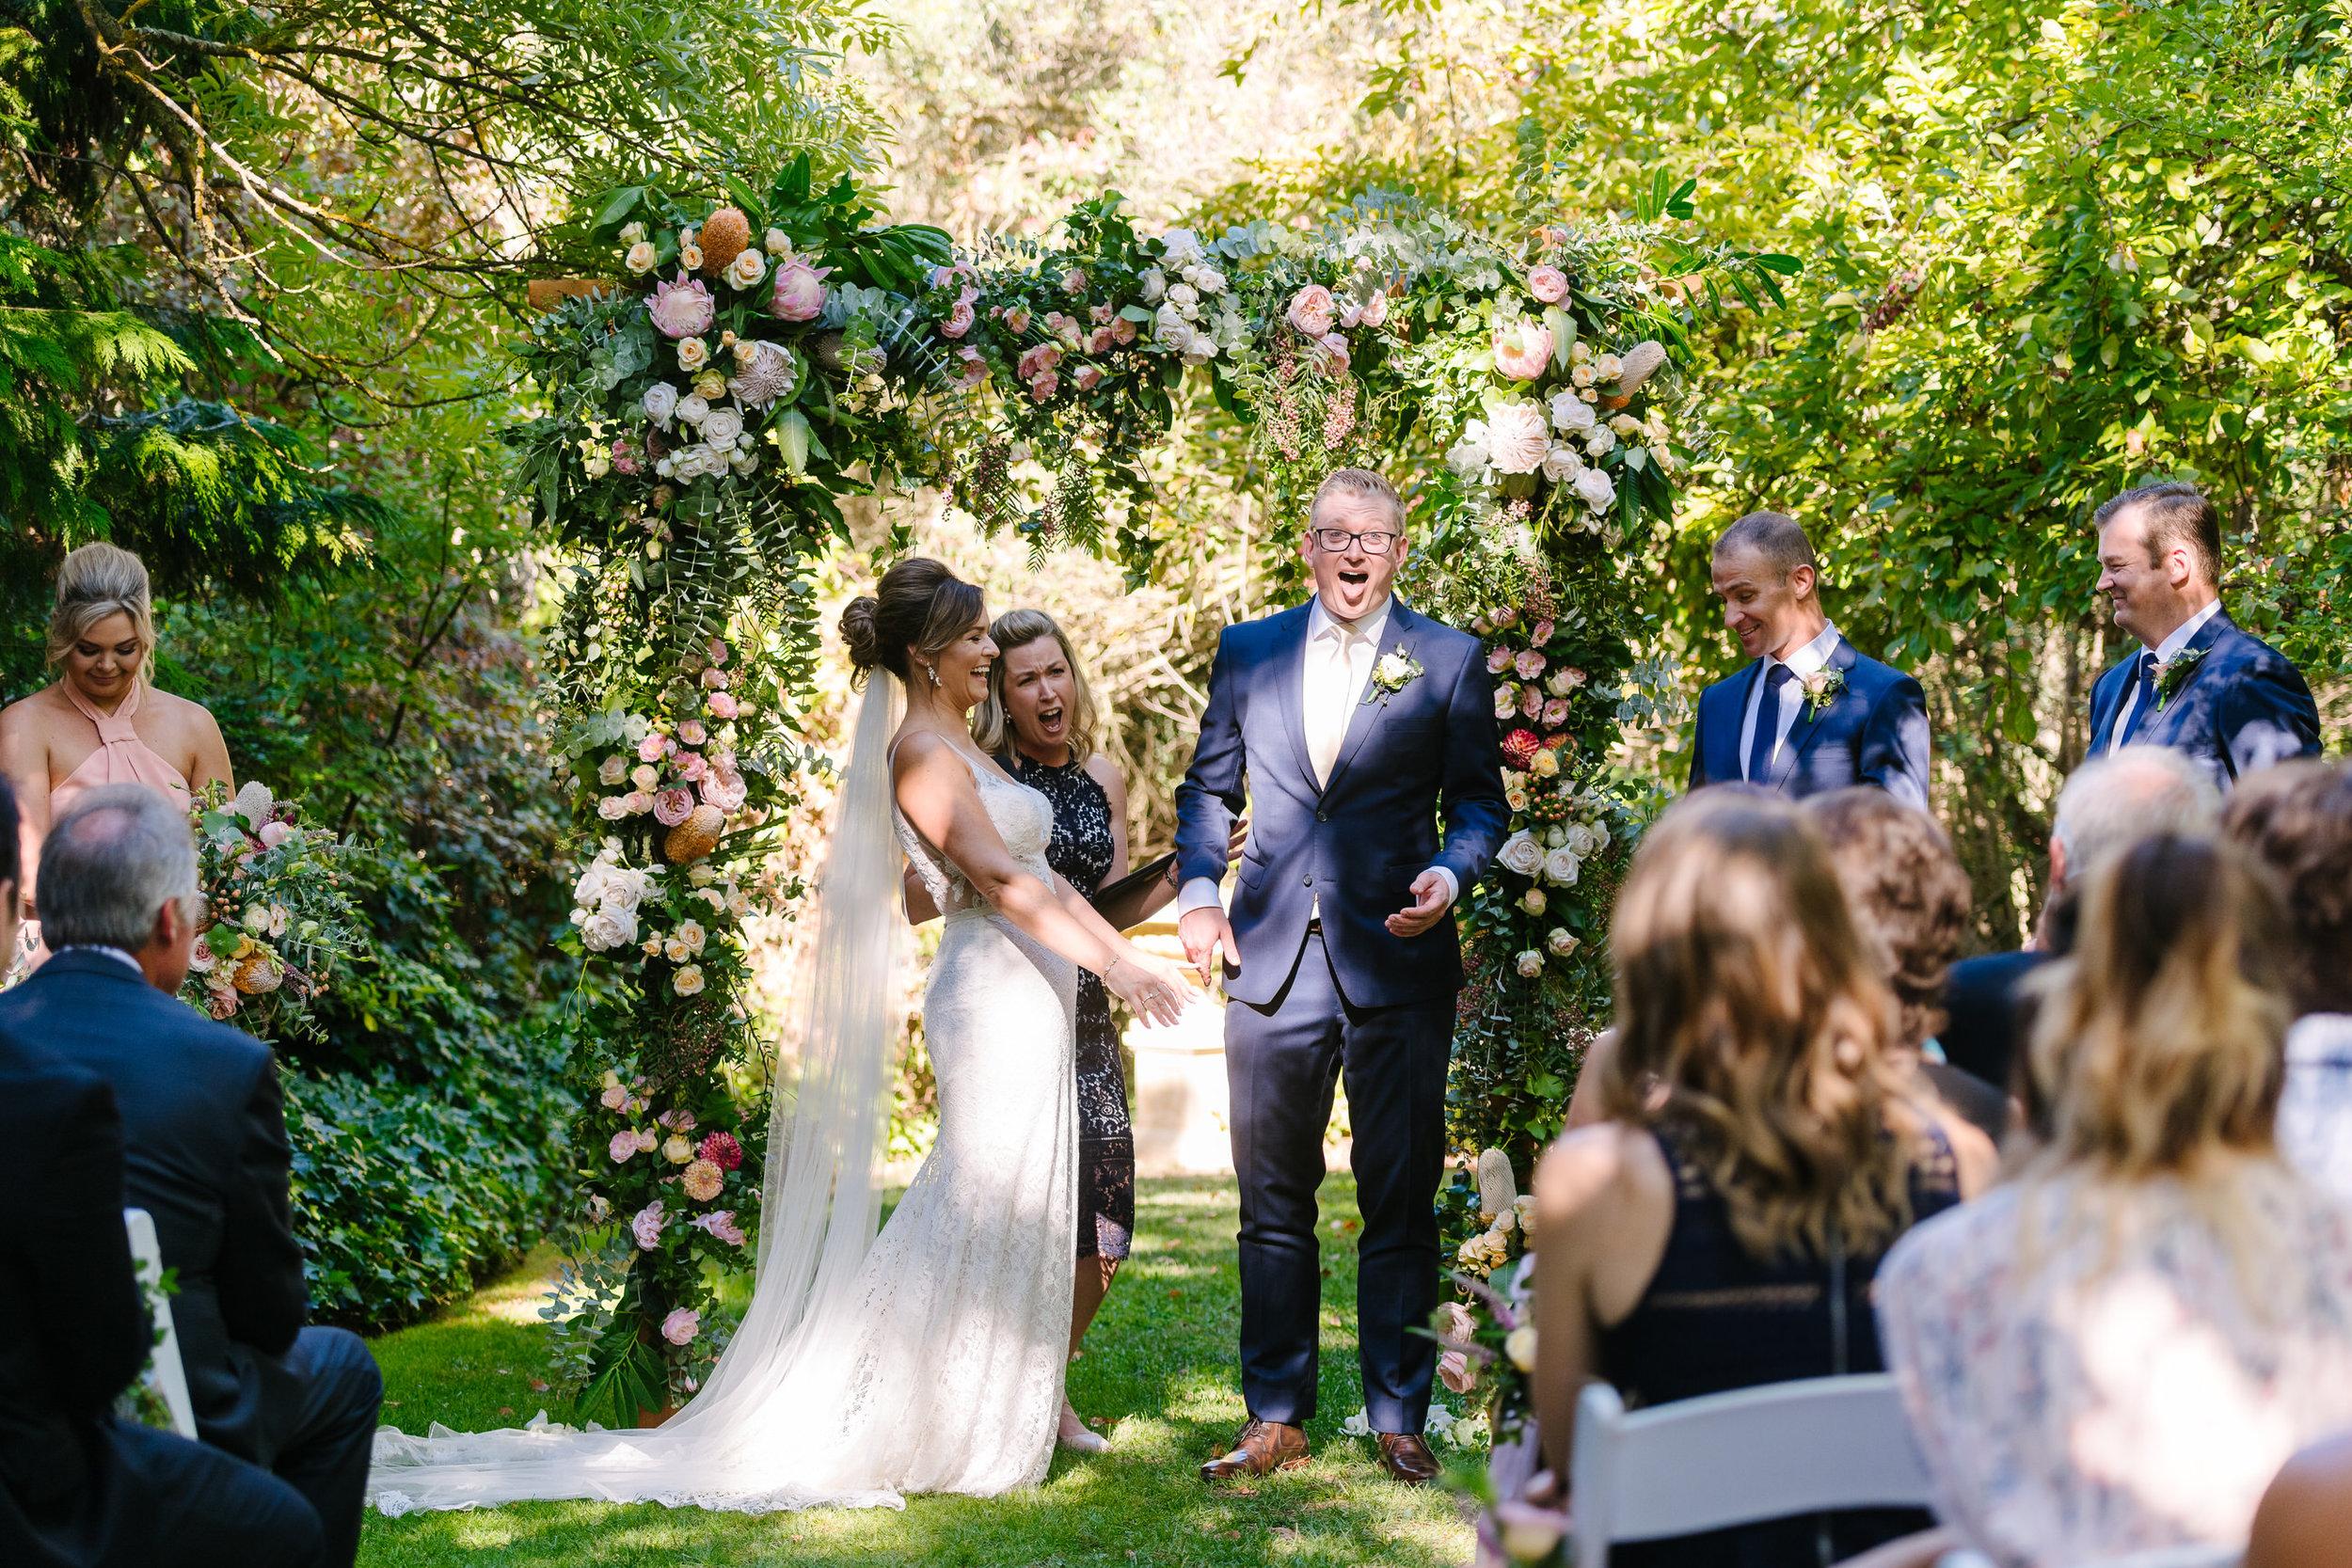 Justin_And_Jim_Photography_Chateau_Dore_Bendigo_Wedding39.JPG